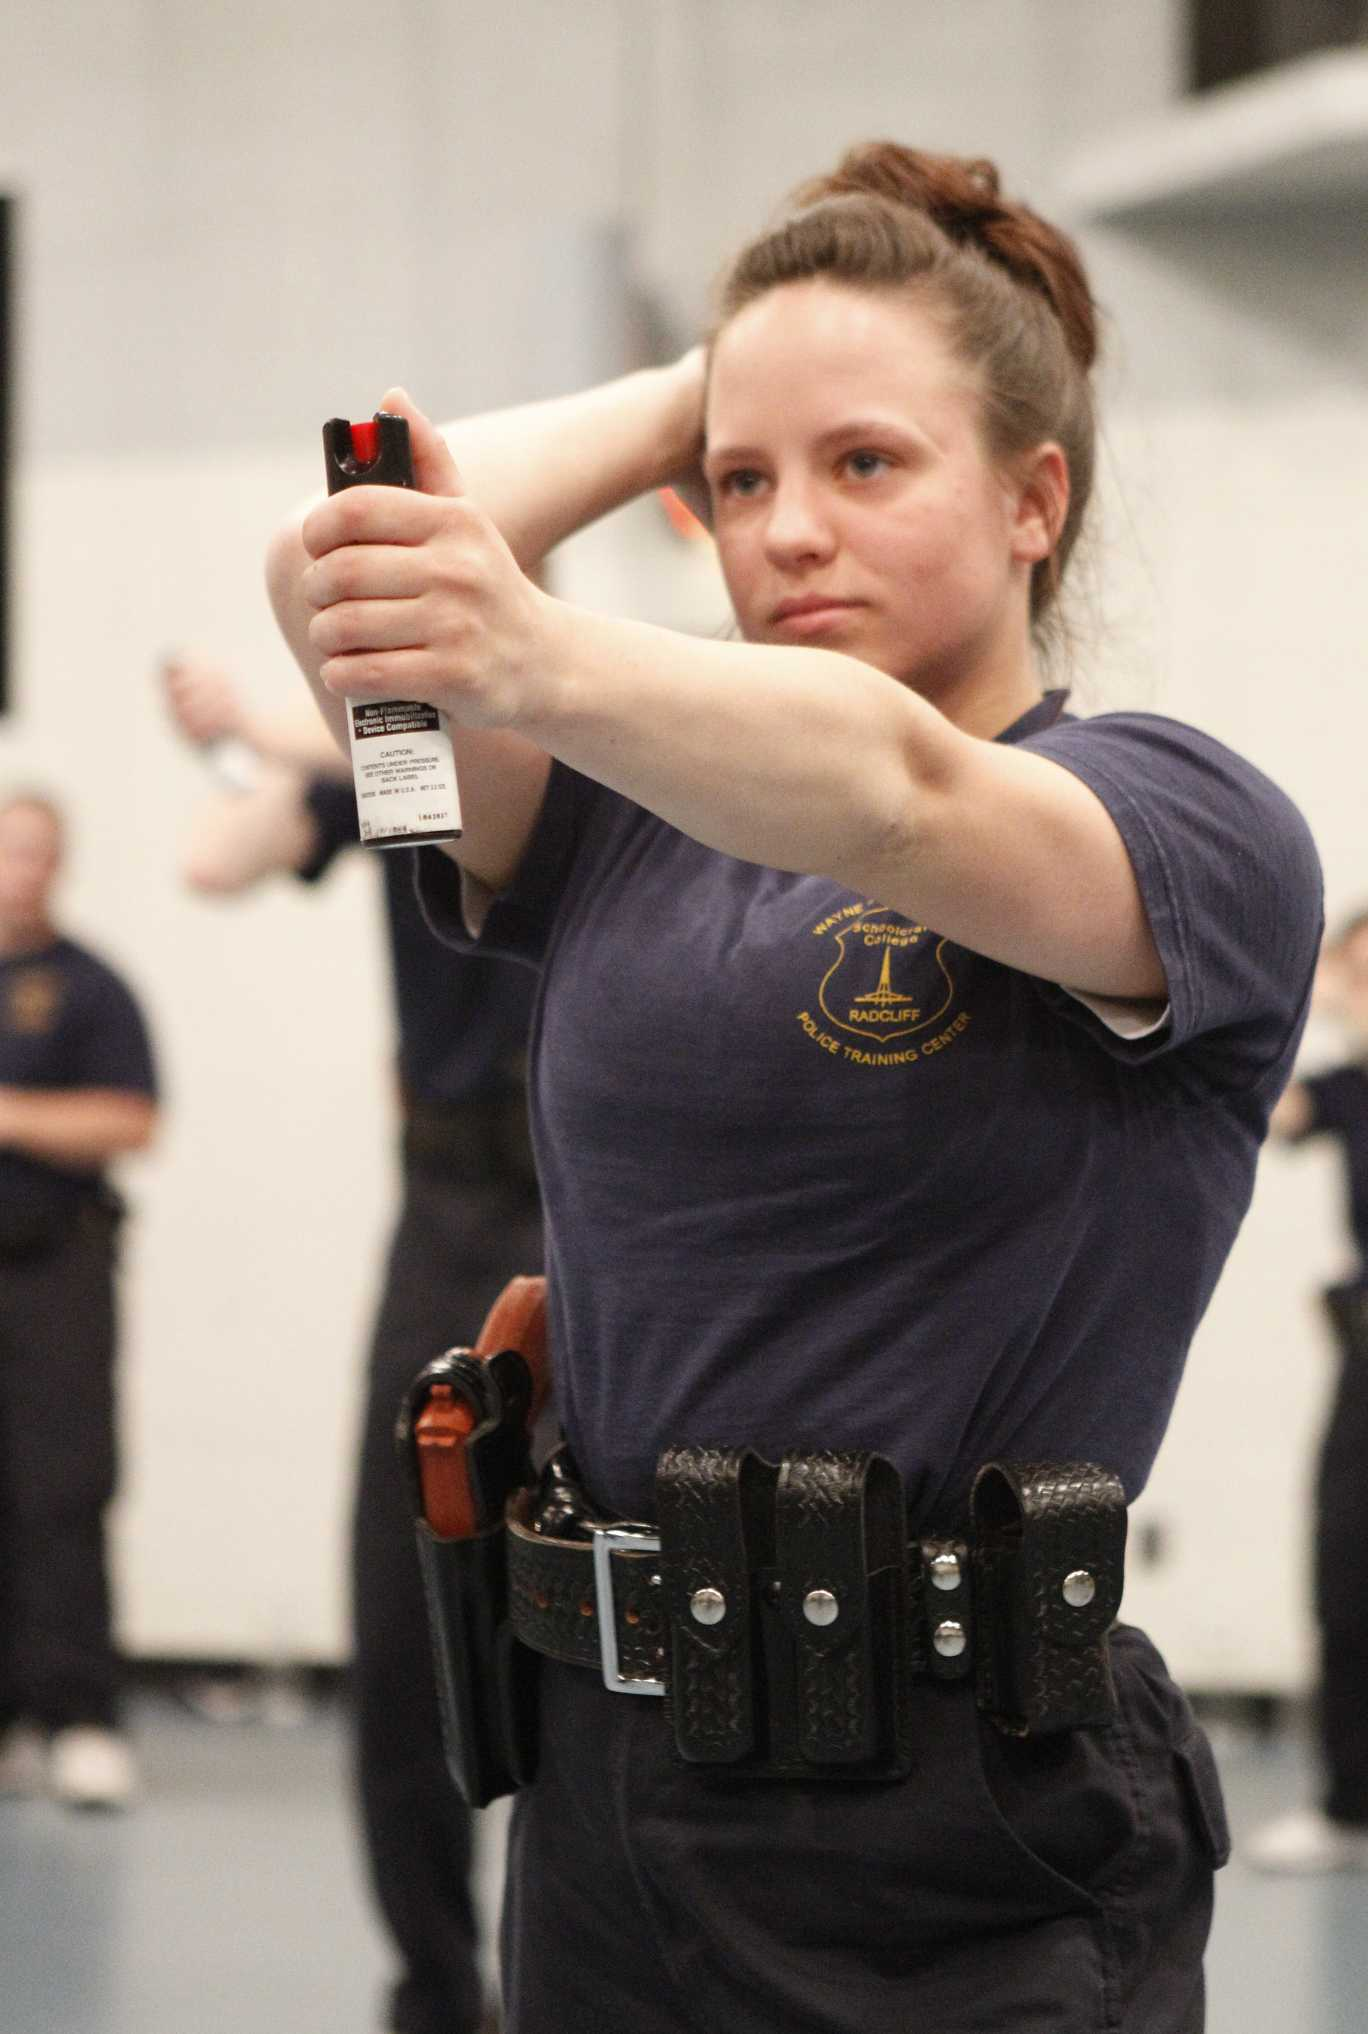 Female cadet learning self-defense techniques.